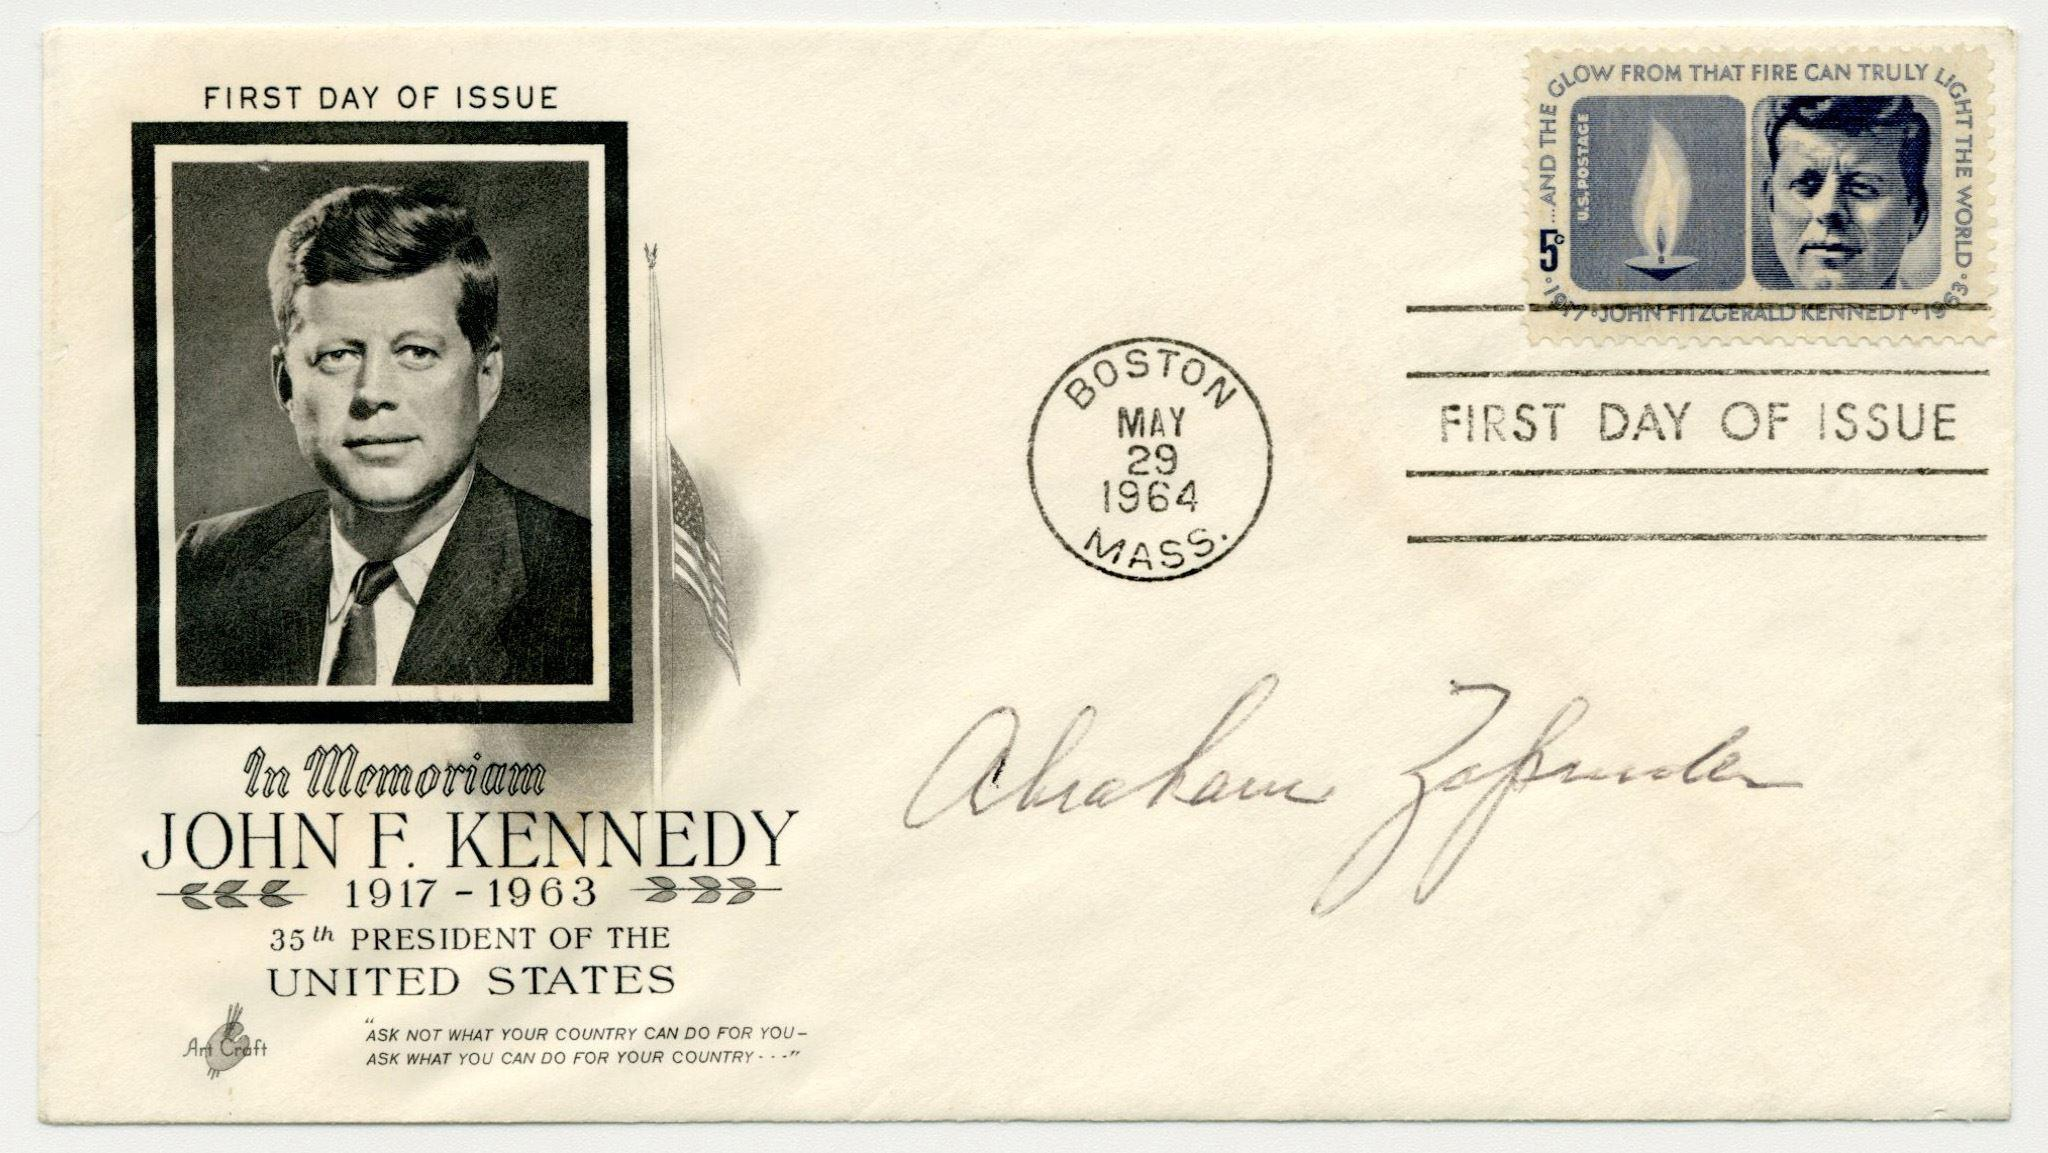 Abraham Zapruder, Filmed JFK Assassination, Signed First Day Cover from JFK's 47th Birthday in 1964